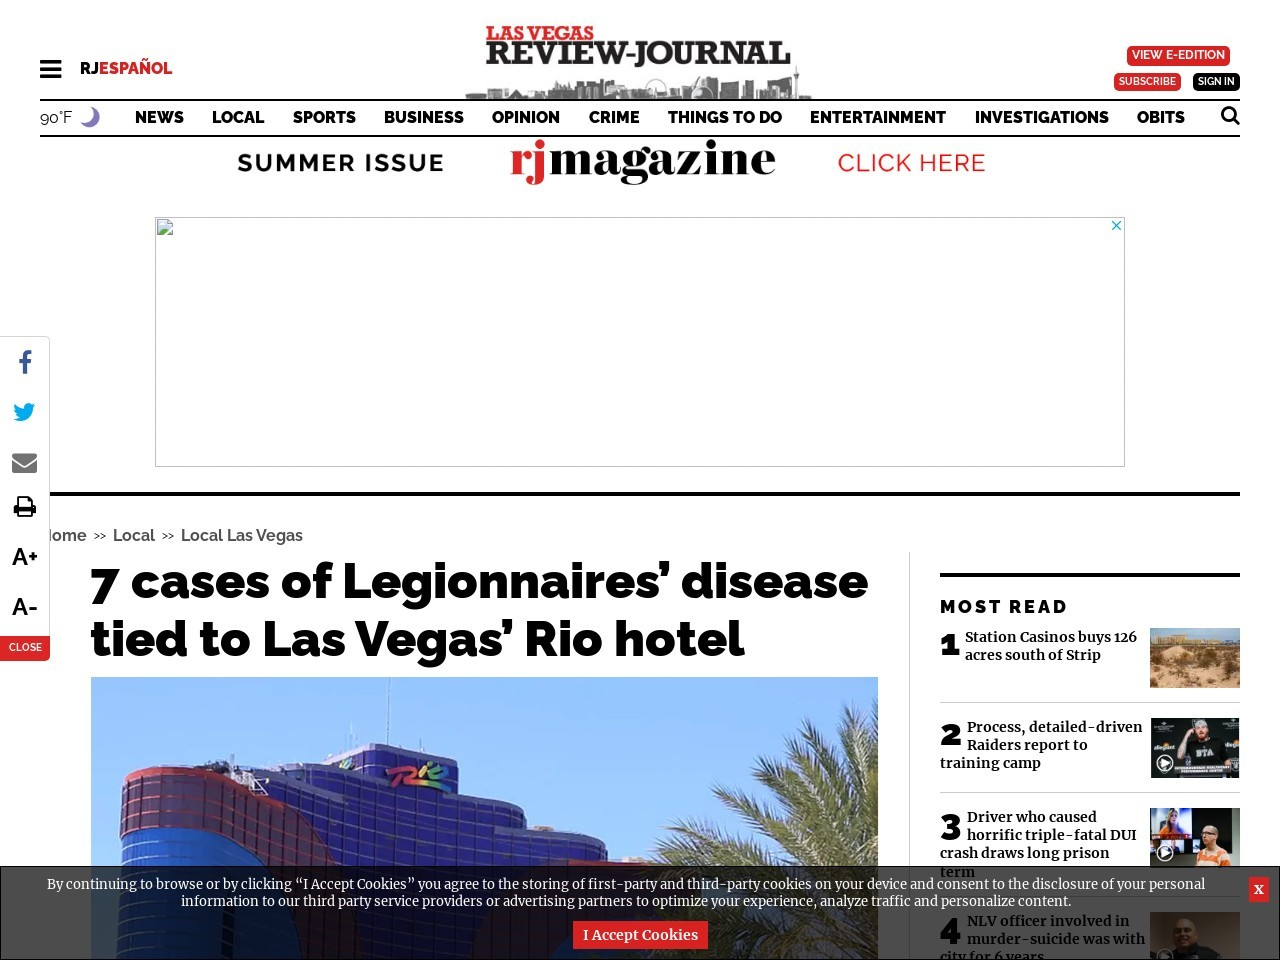 7 cases of Legionnaires' disease tied to Las Vegas' Rio hotel